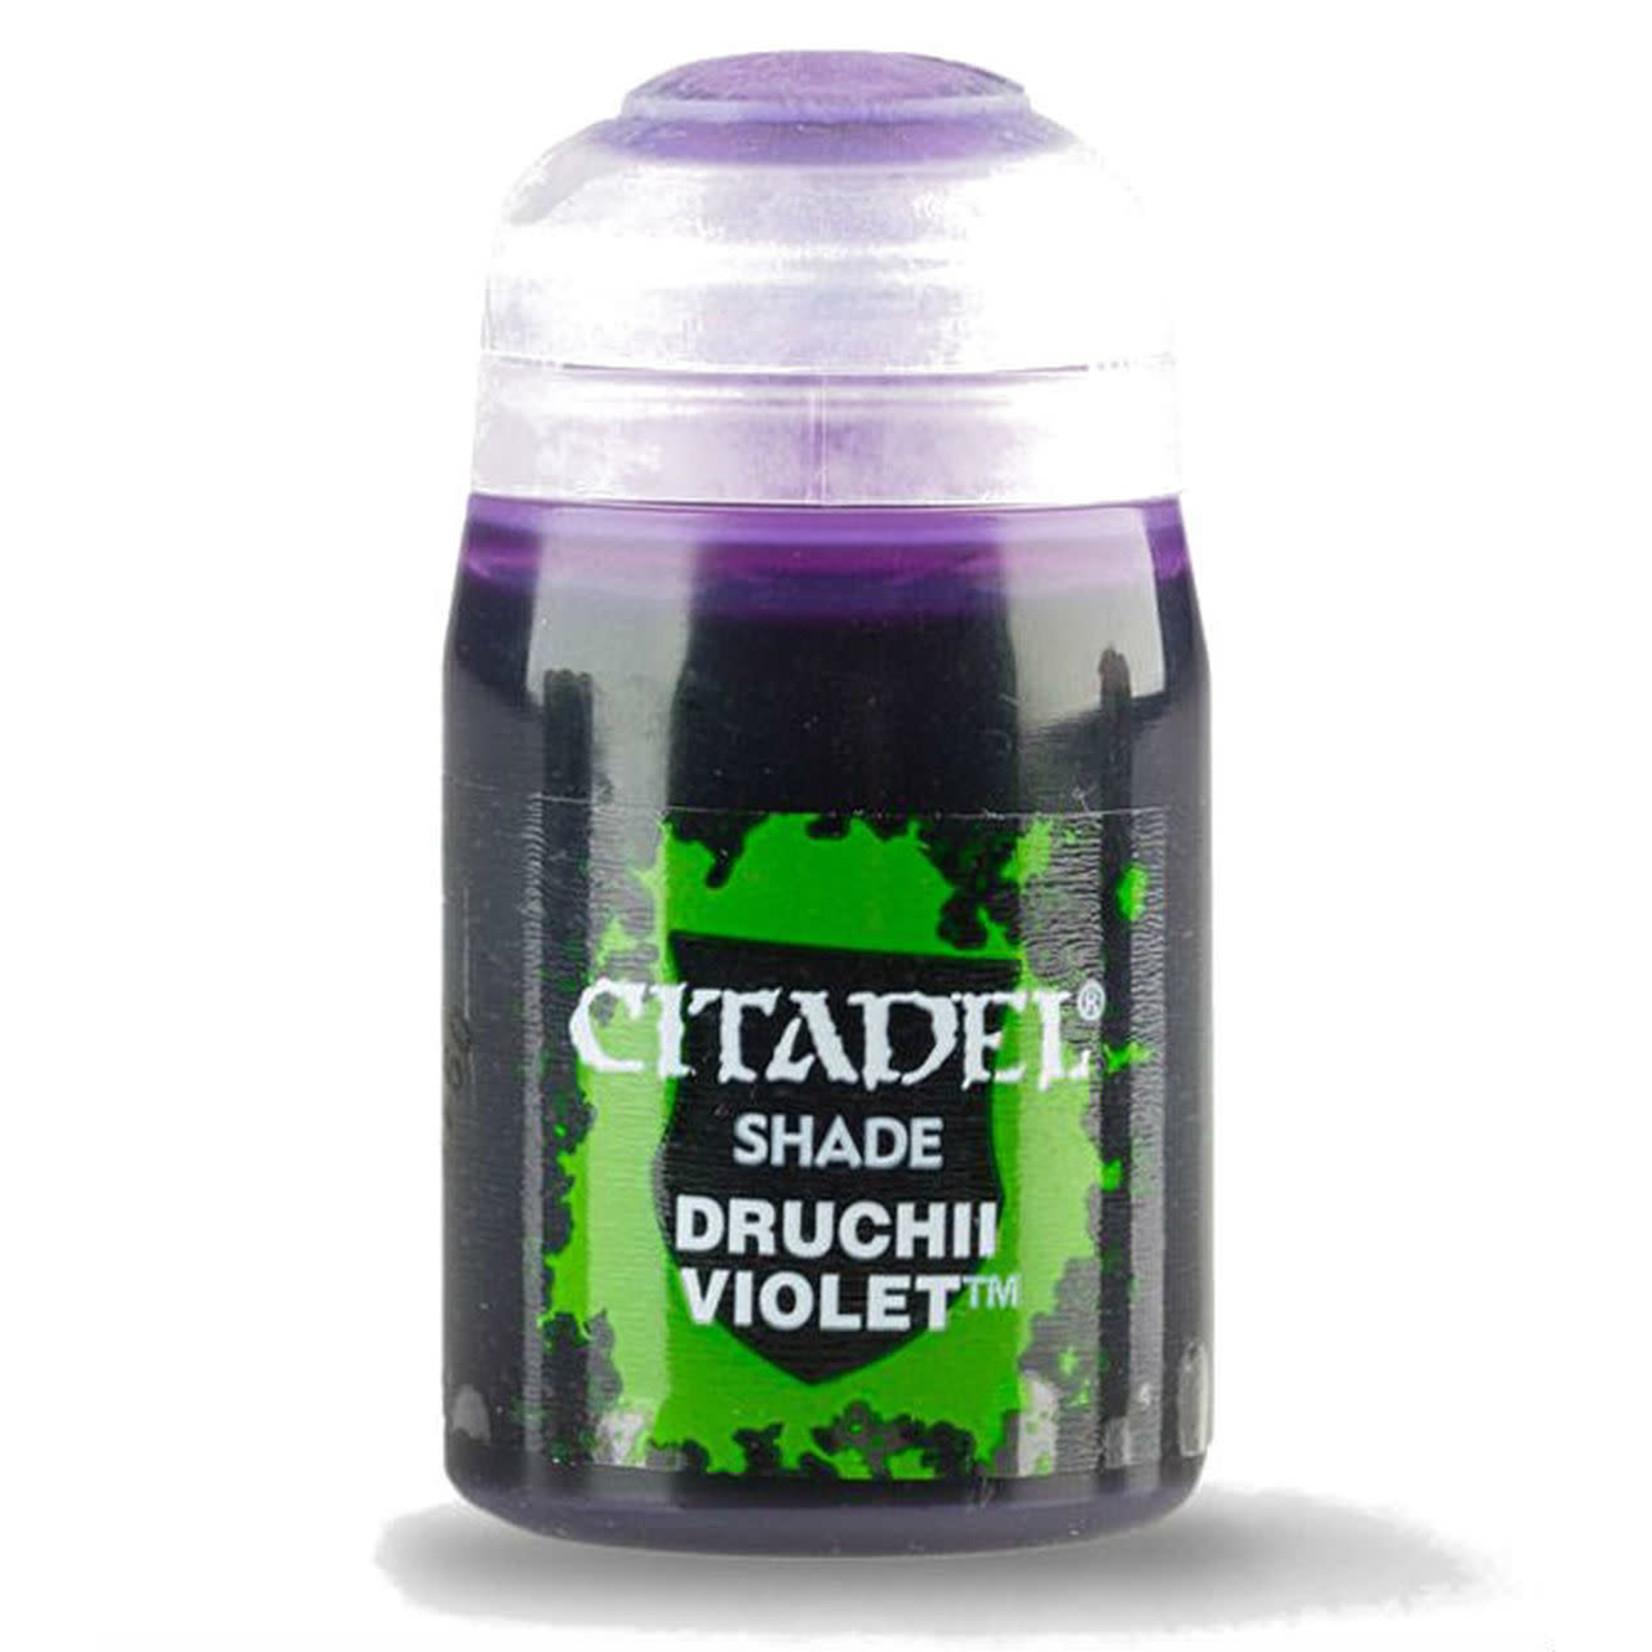 Games Workshop Citadel Paint: Druchii Violet 24ml